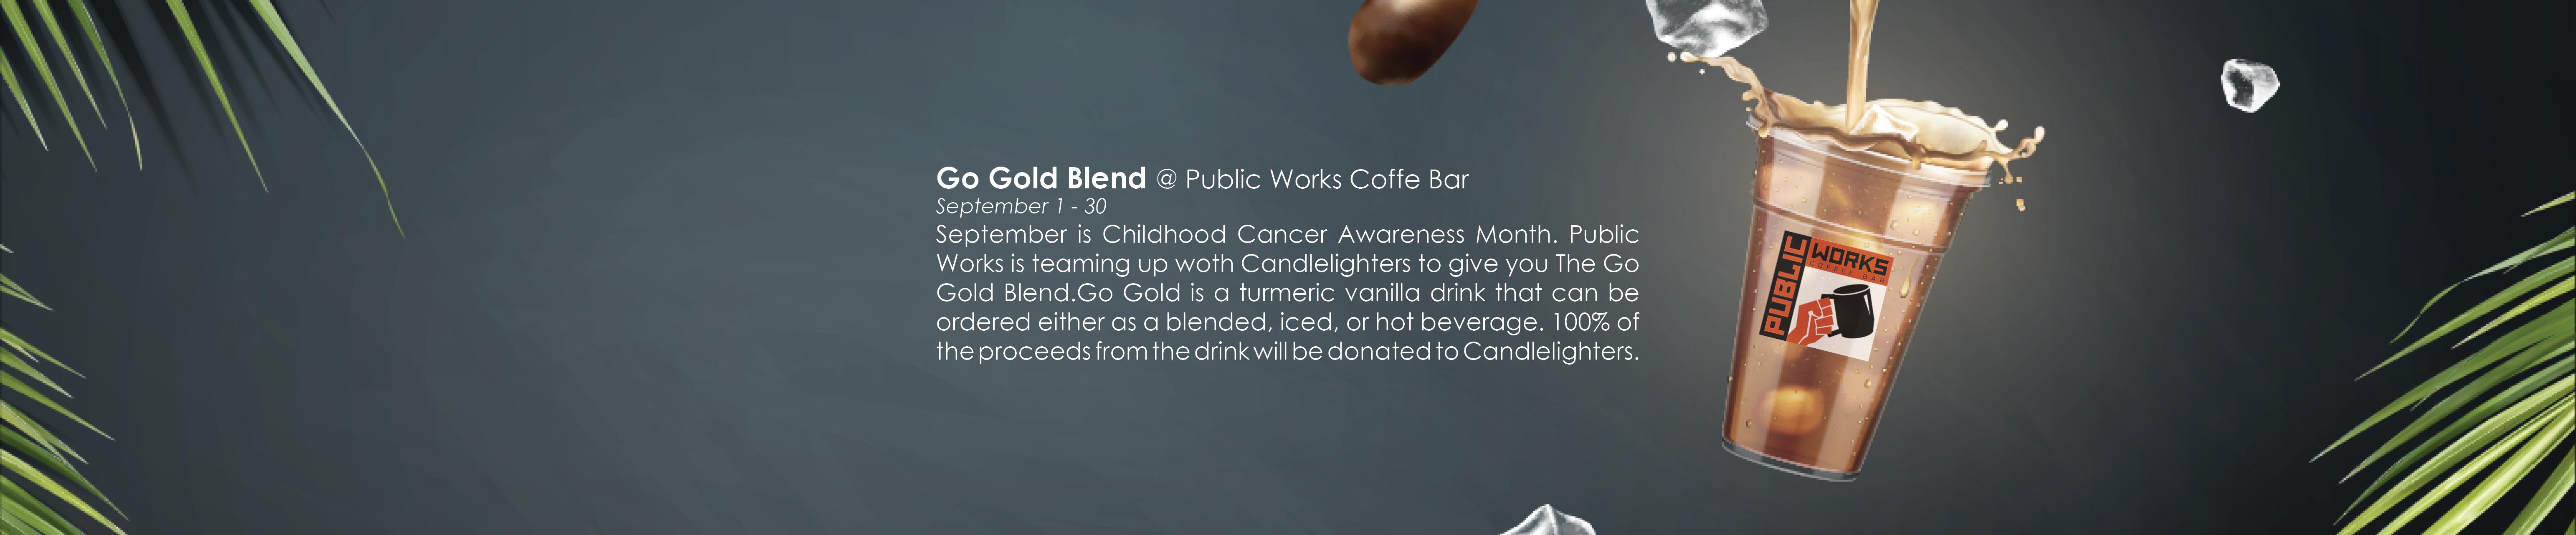 Taste Public Works' Go Gold Blend!